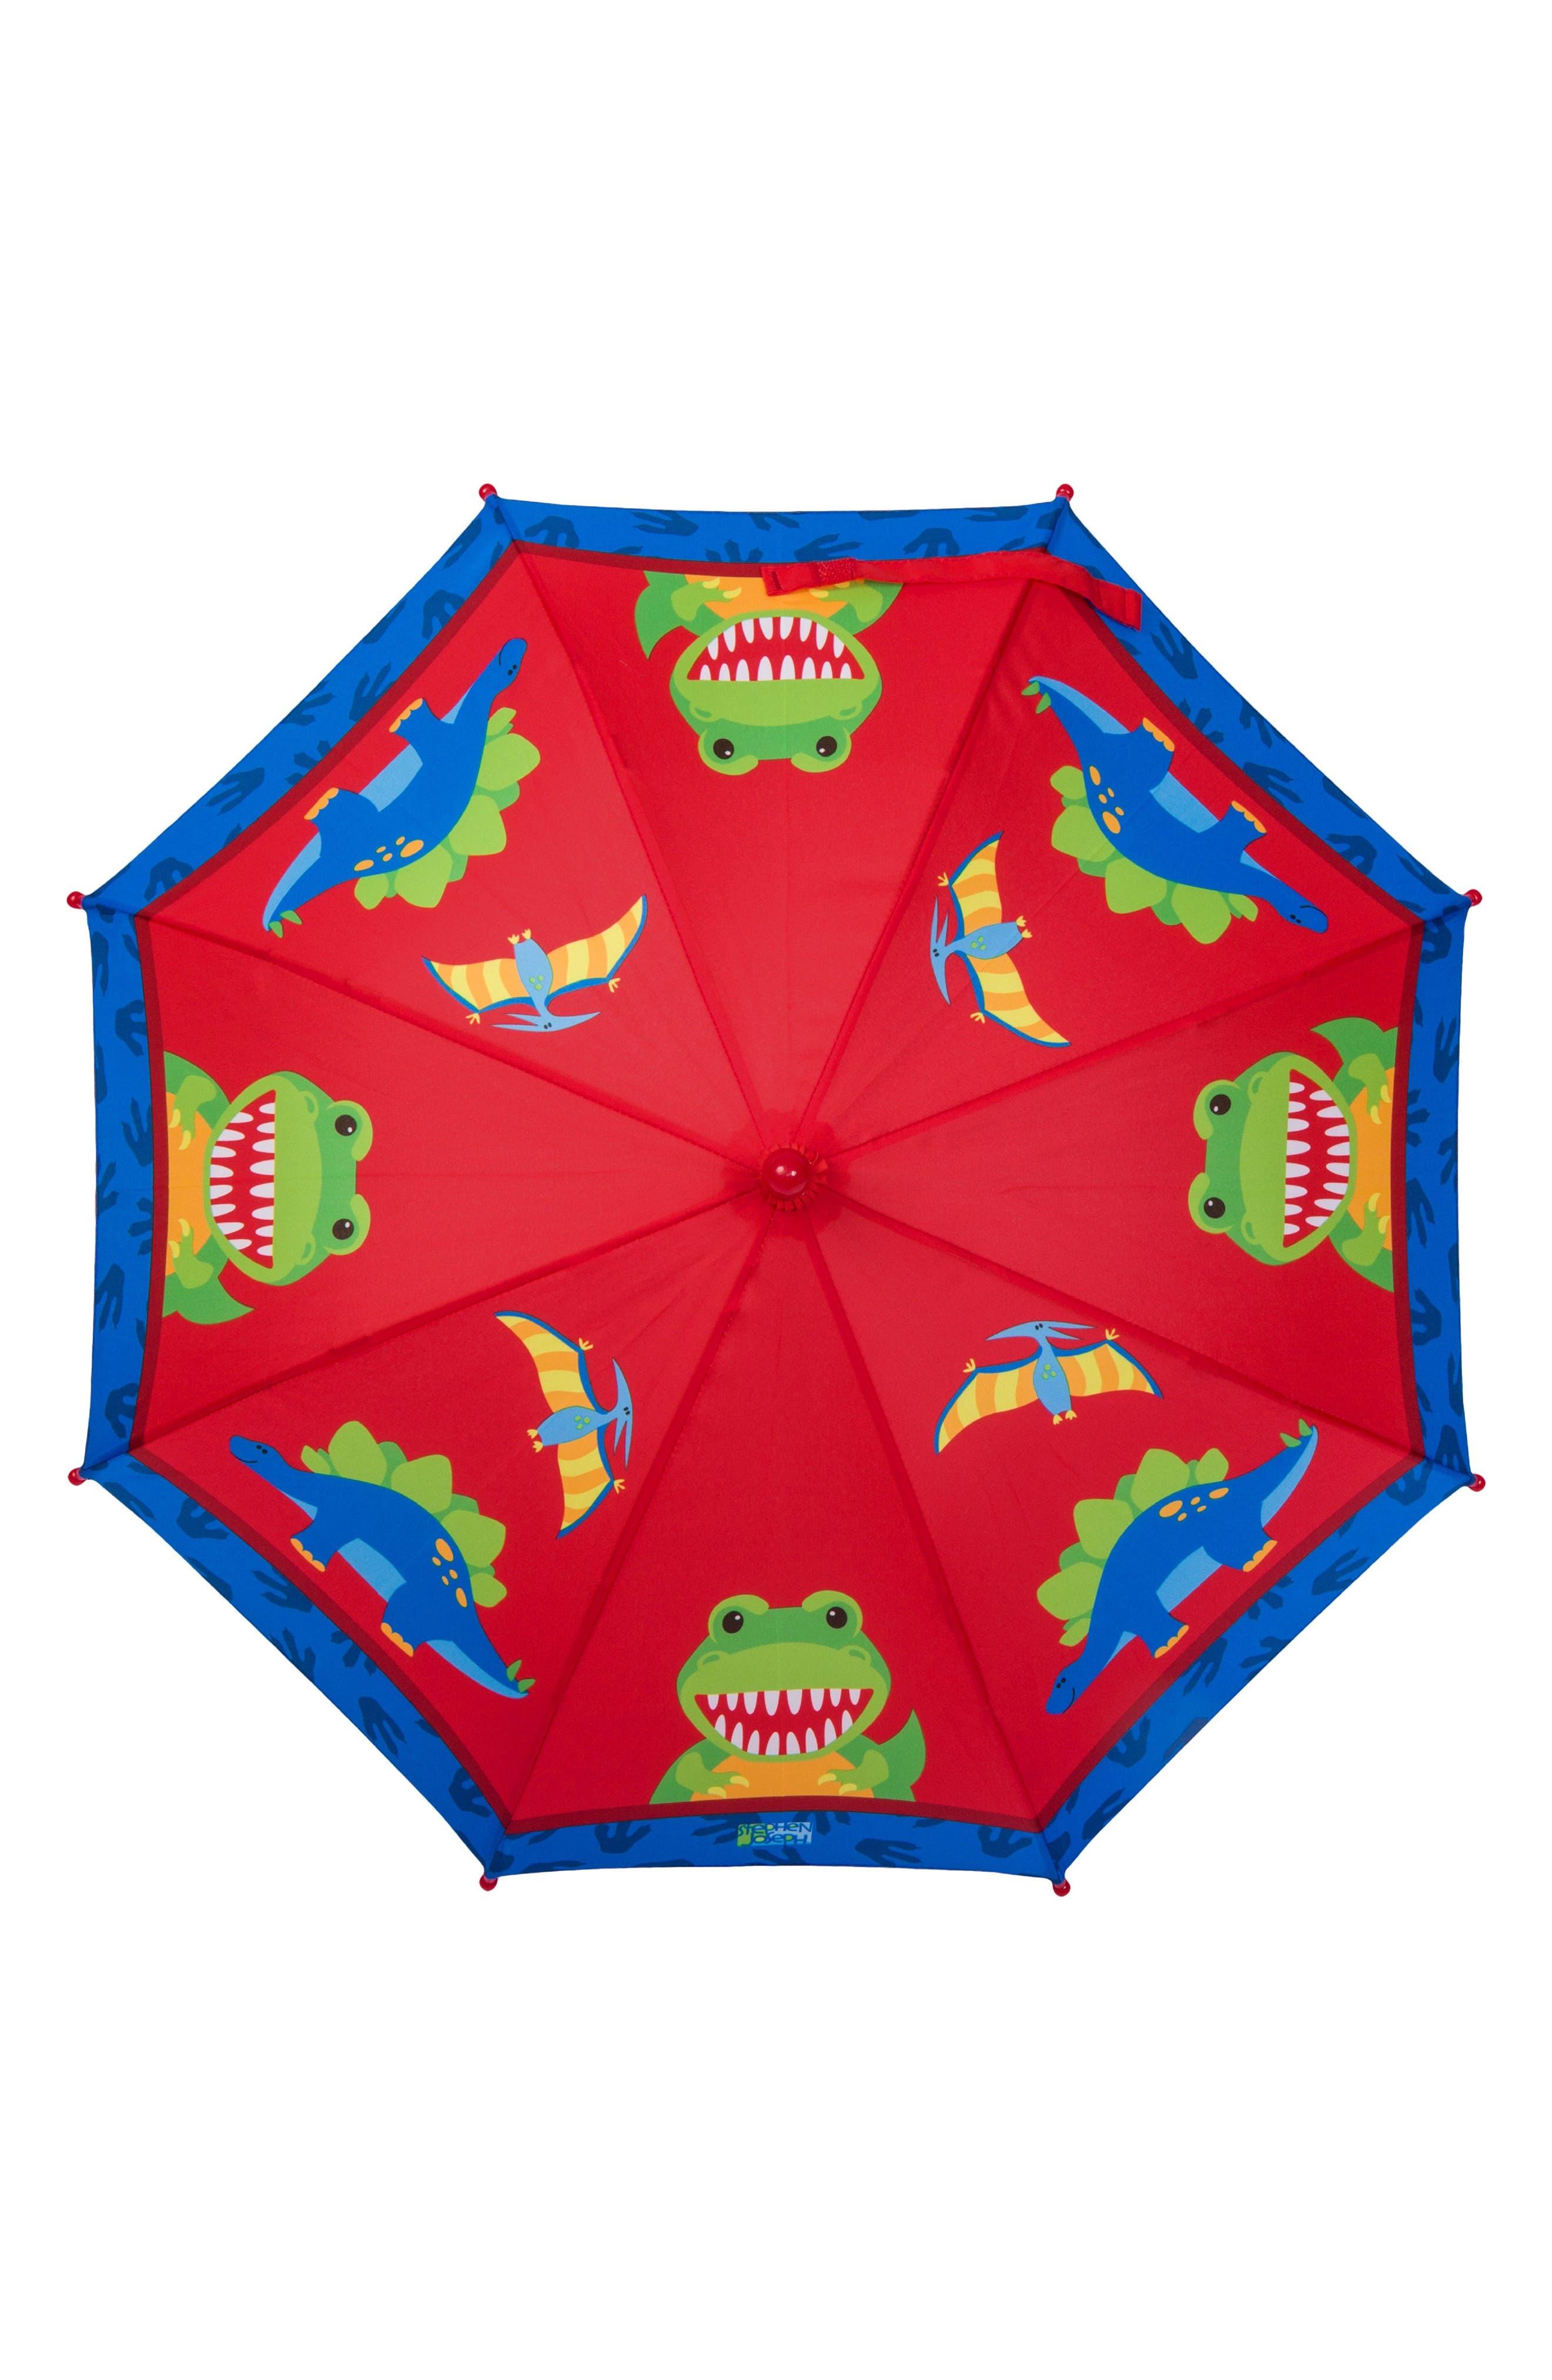 Dinosaur Truck Rain Boots & Umbrella Set,                             Alternate thumbnail 2, color,                             600